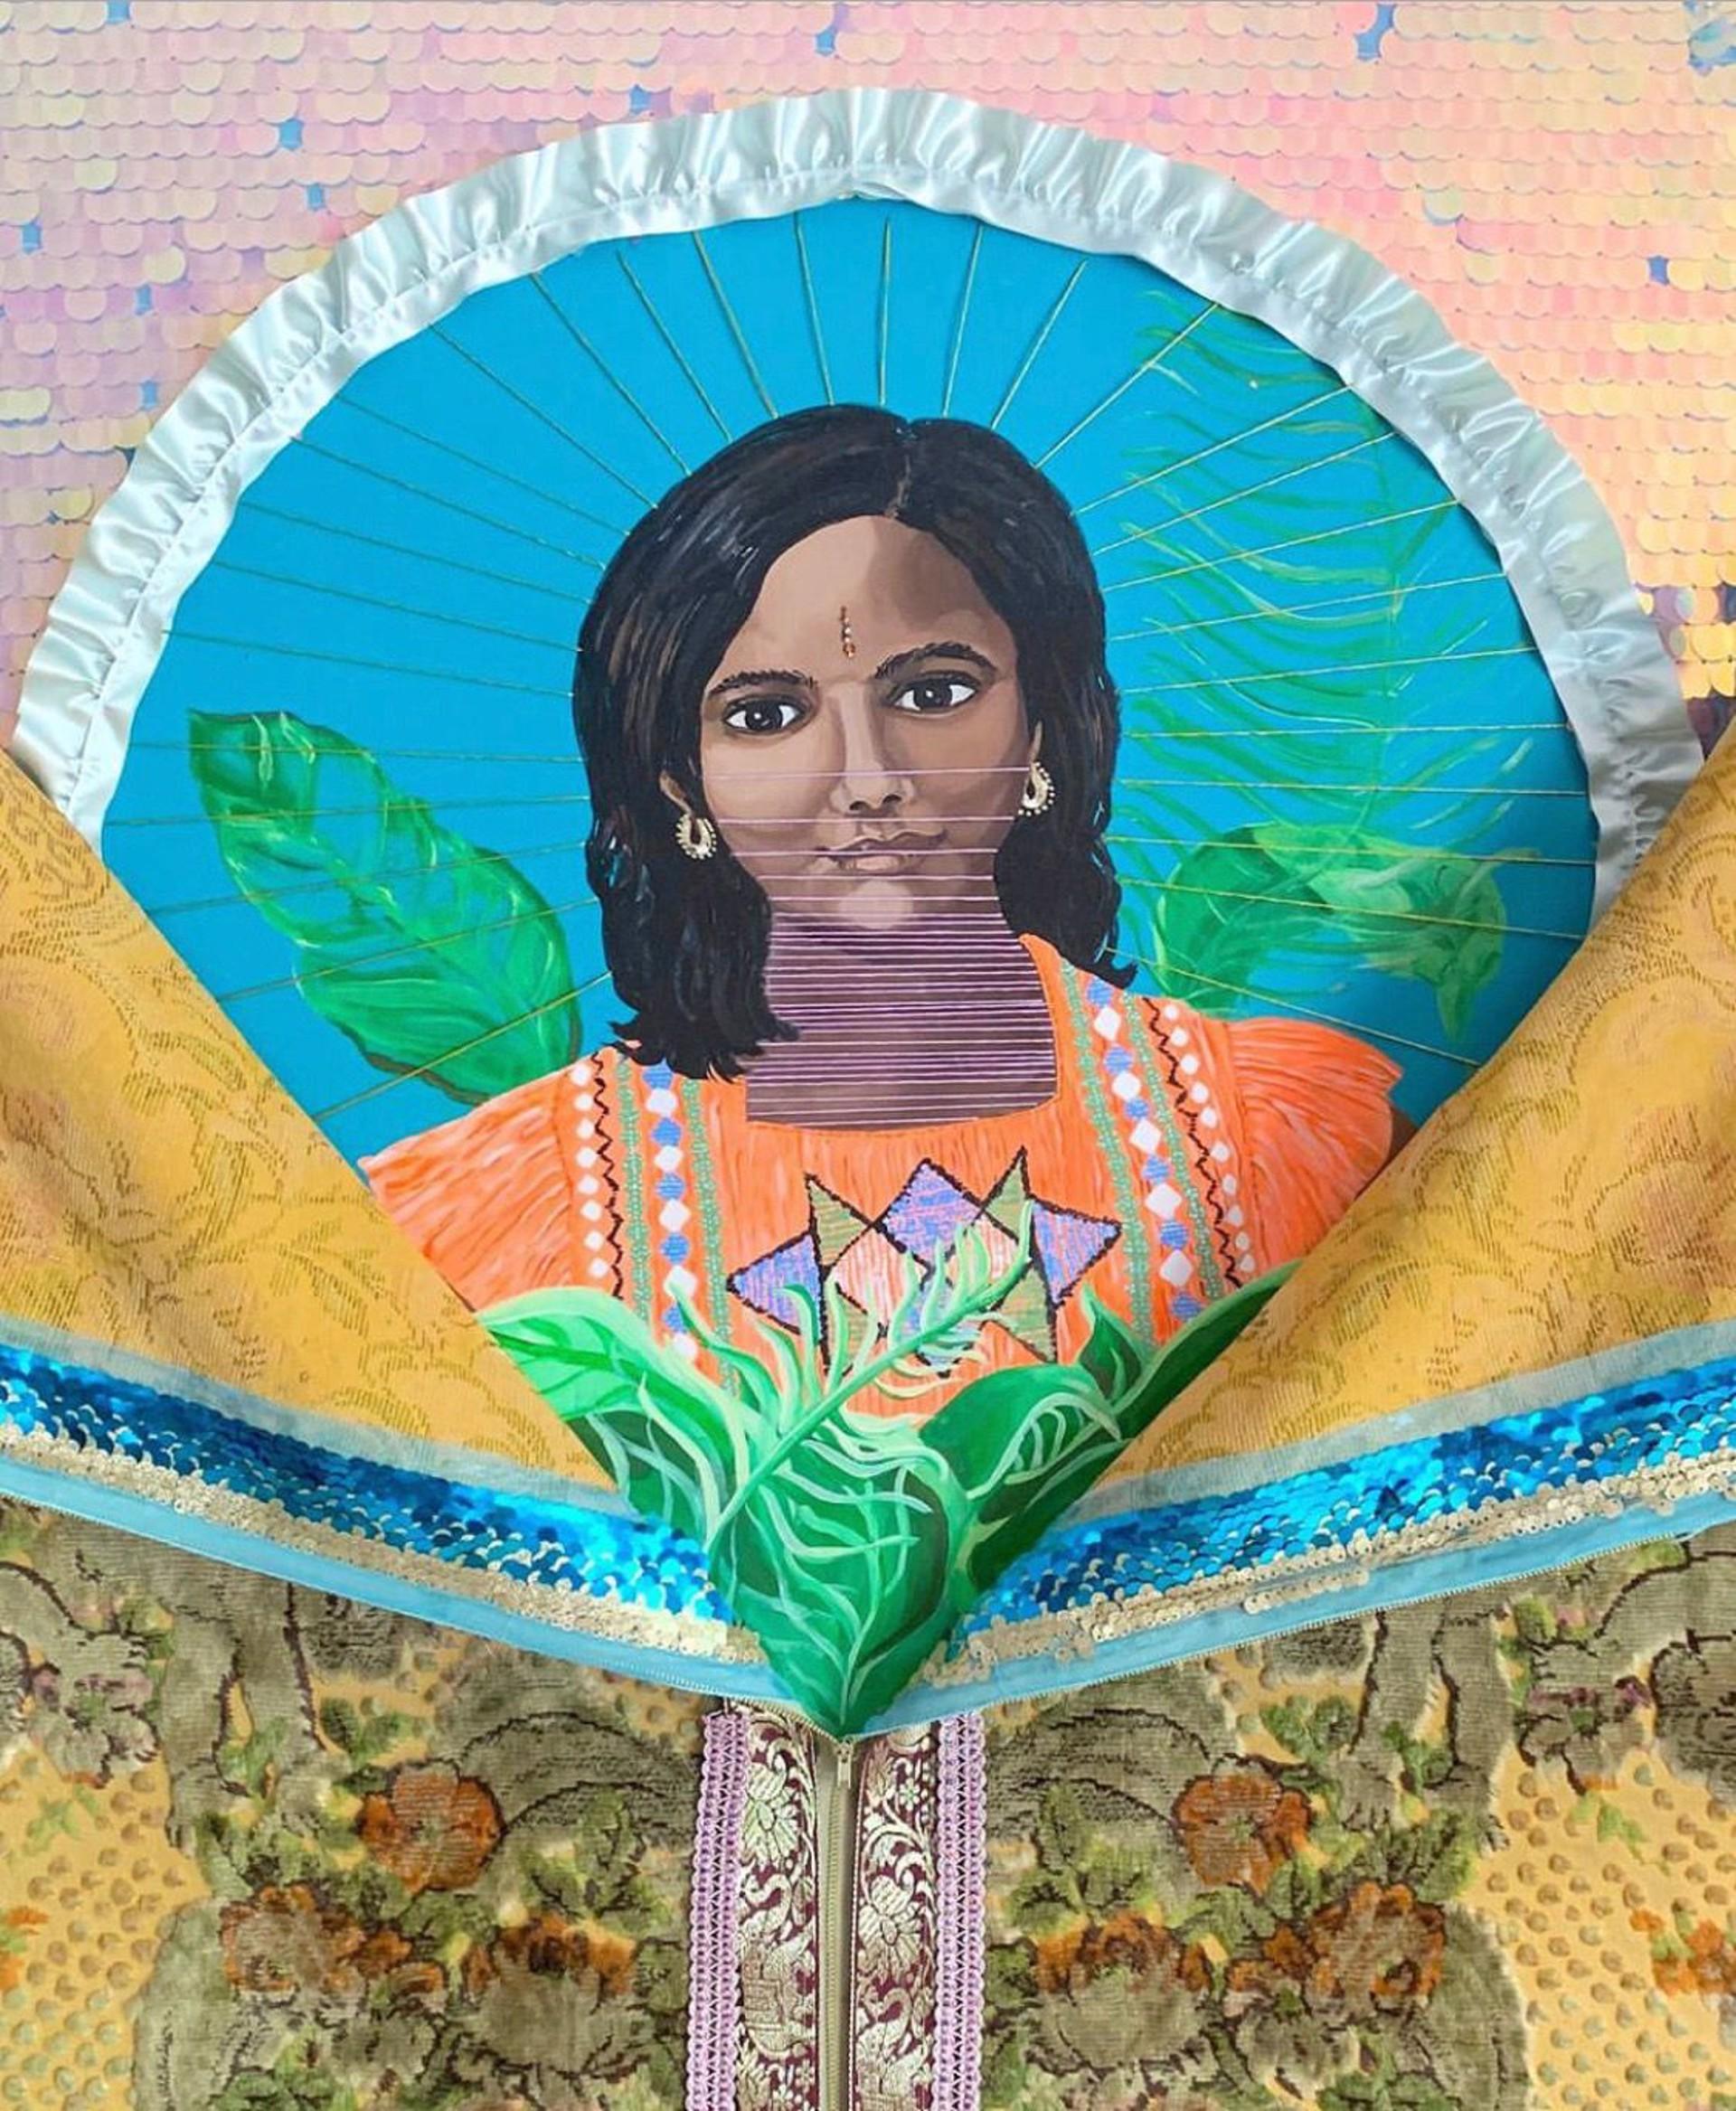 Caribbean Queen by Suchitra Mattai